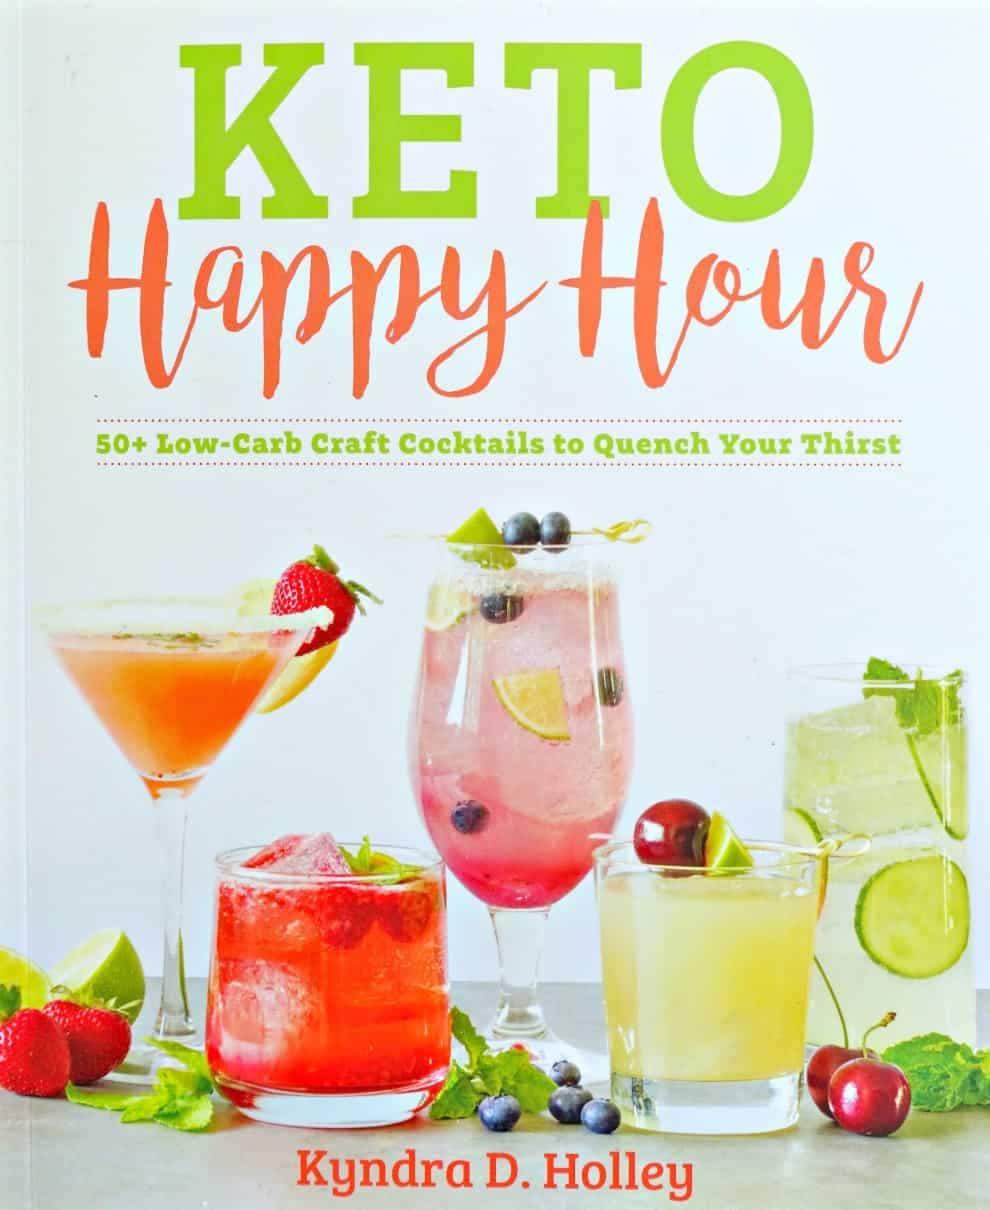 Keto Happpy Hour book